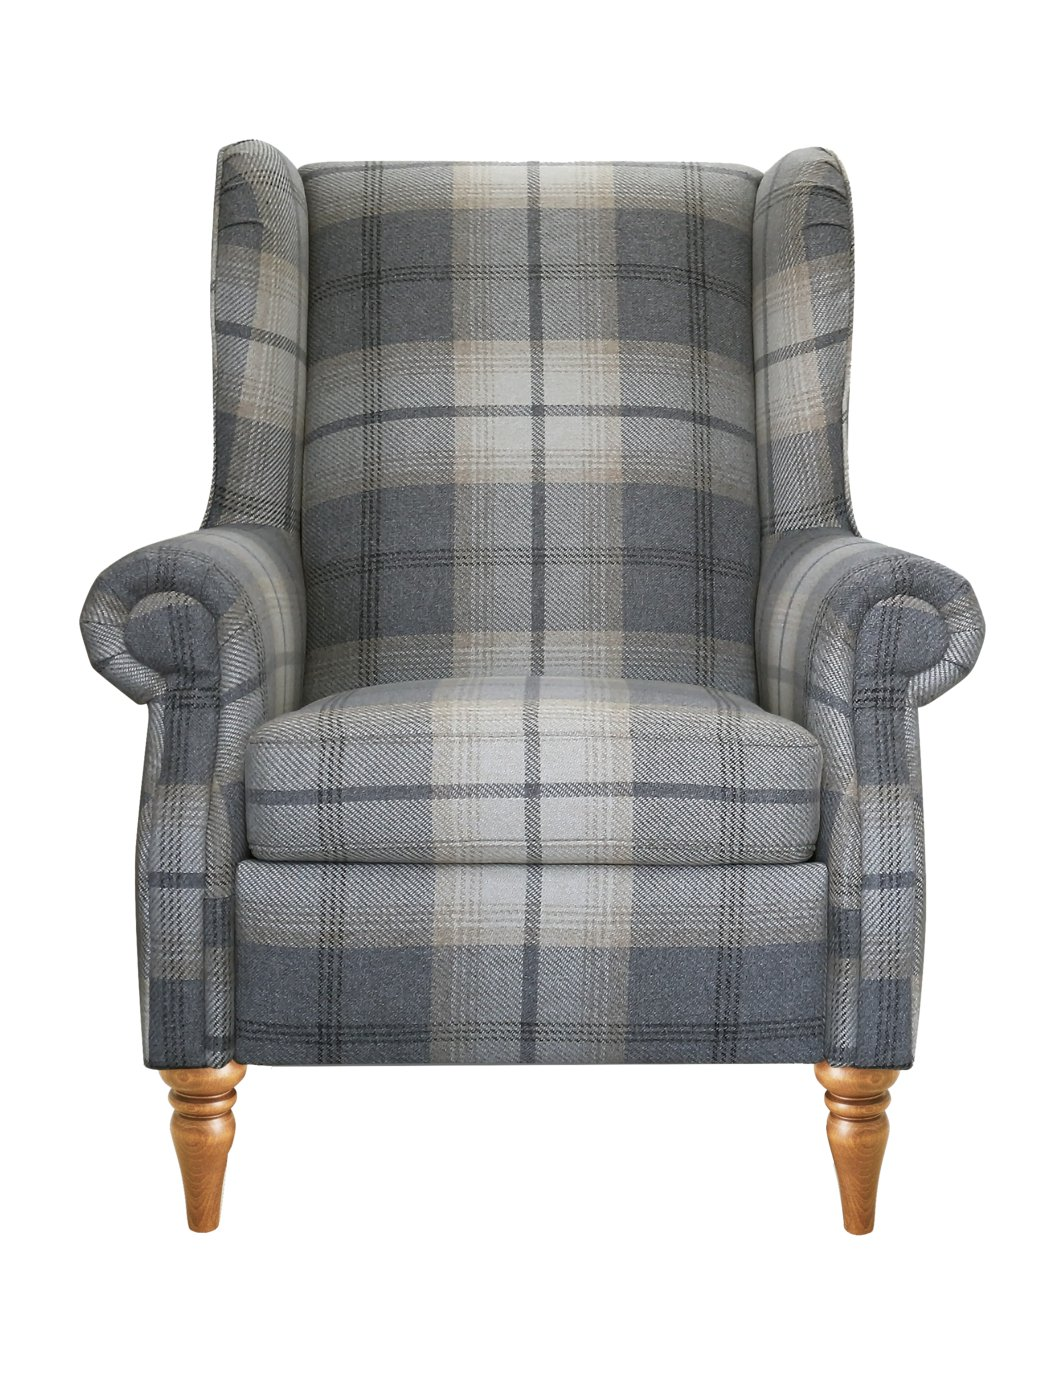 Argos Home Argyll Fabric High Back Chair - Light Grey Check